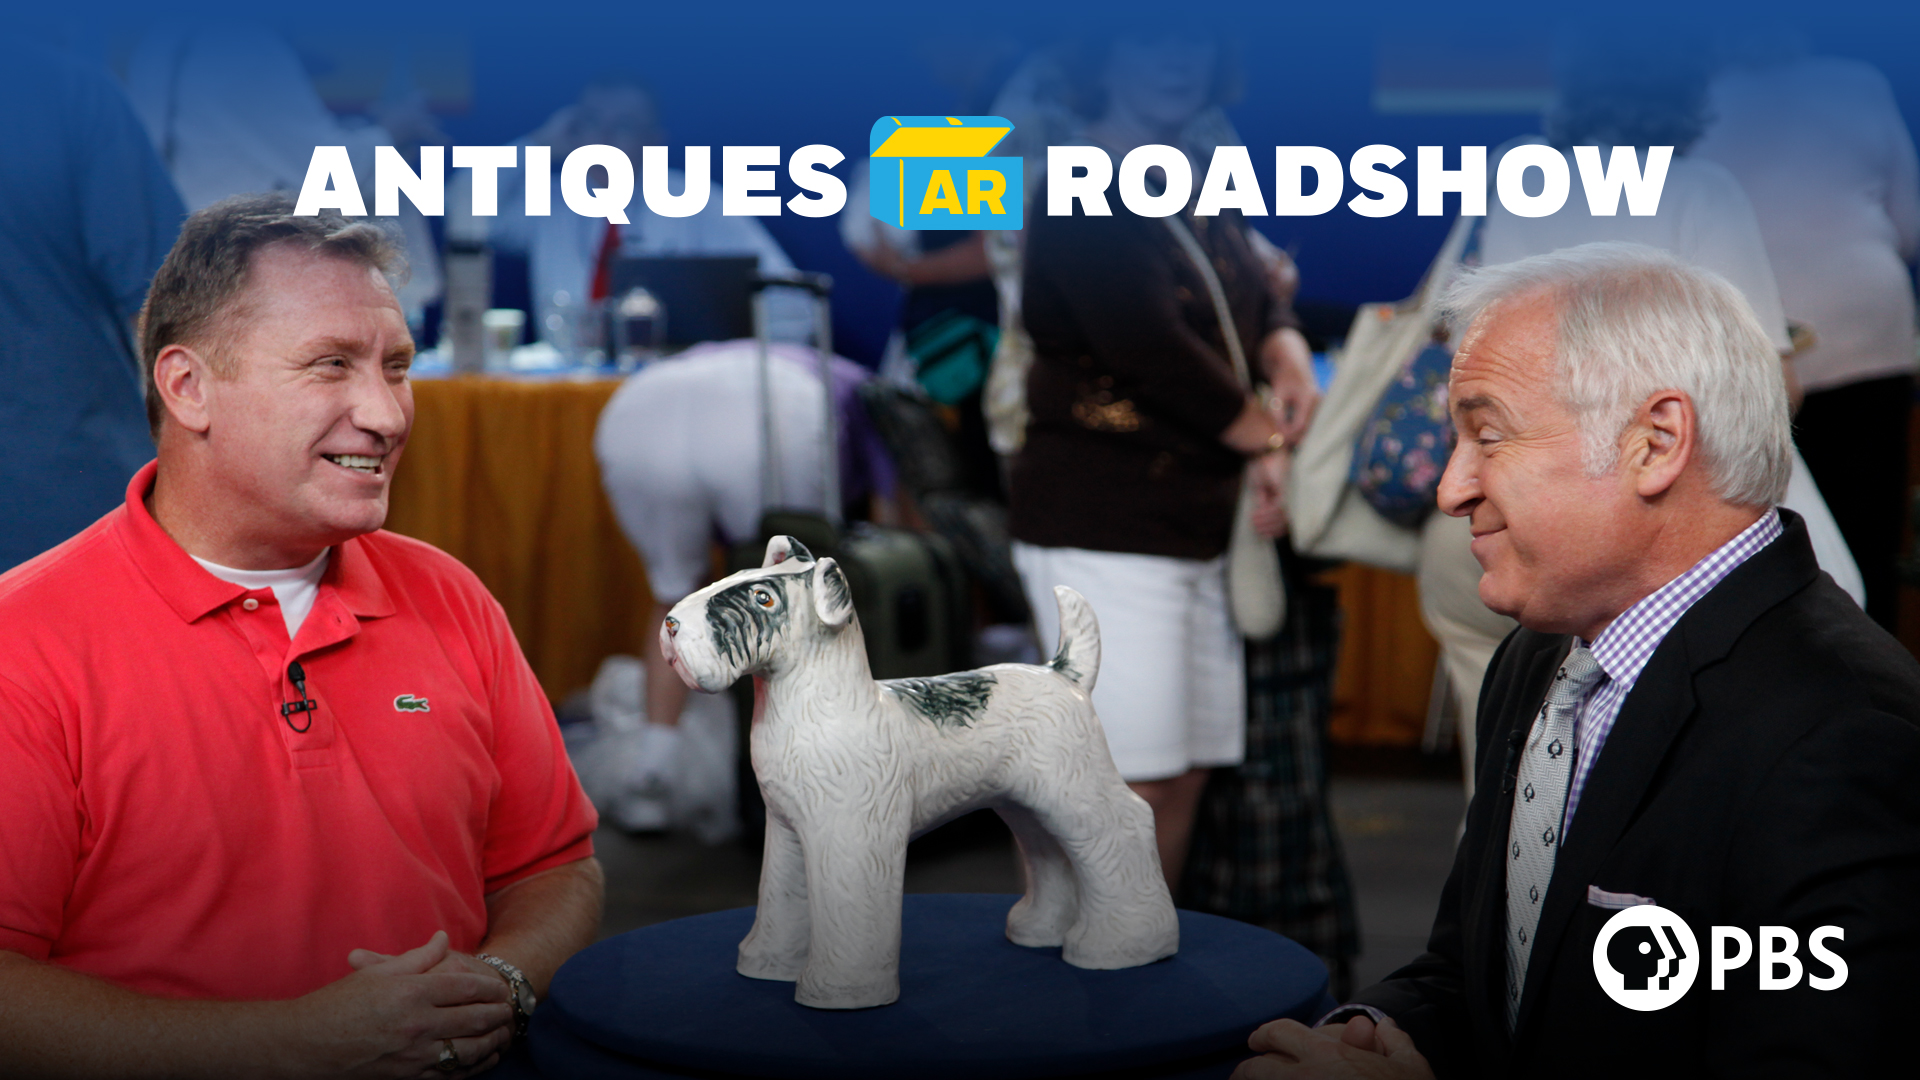 Antiques Roadshow: Season 17